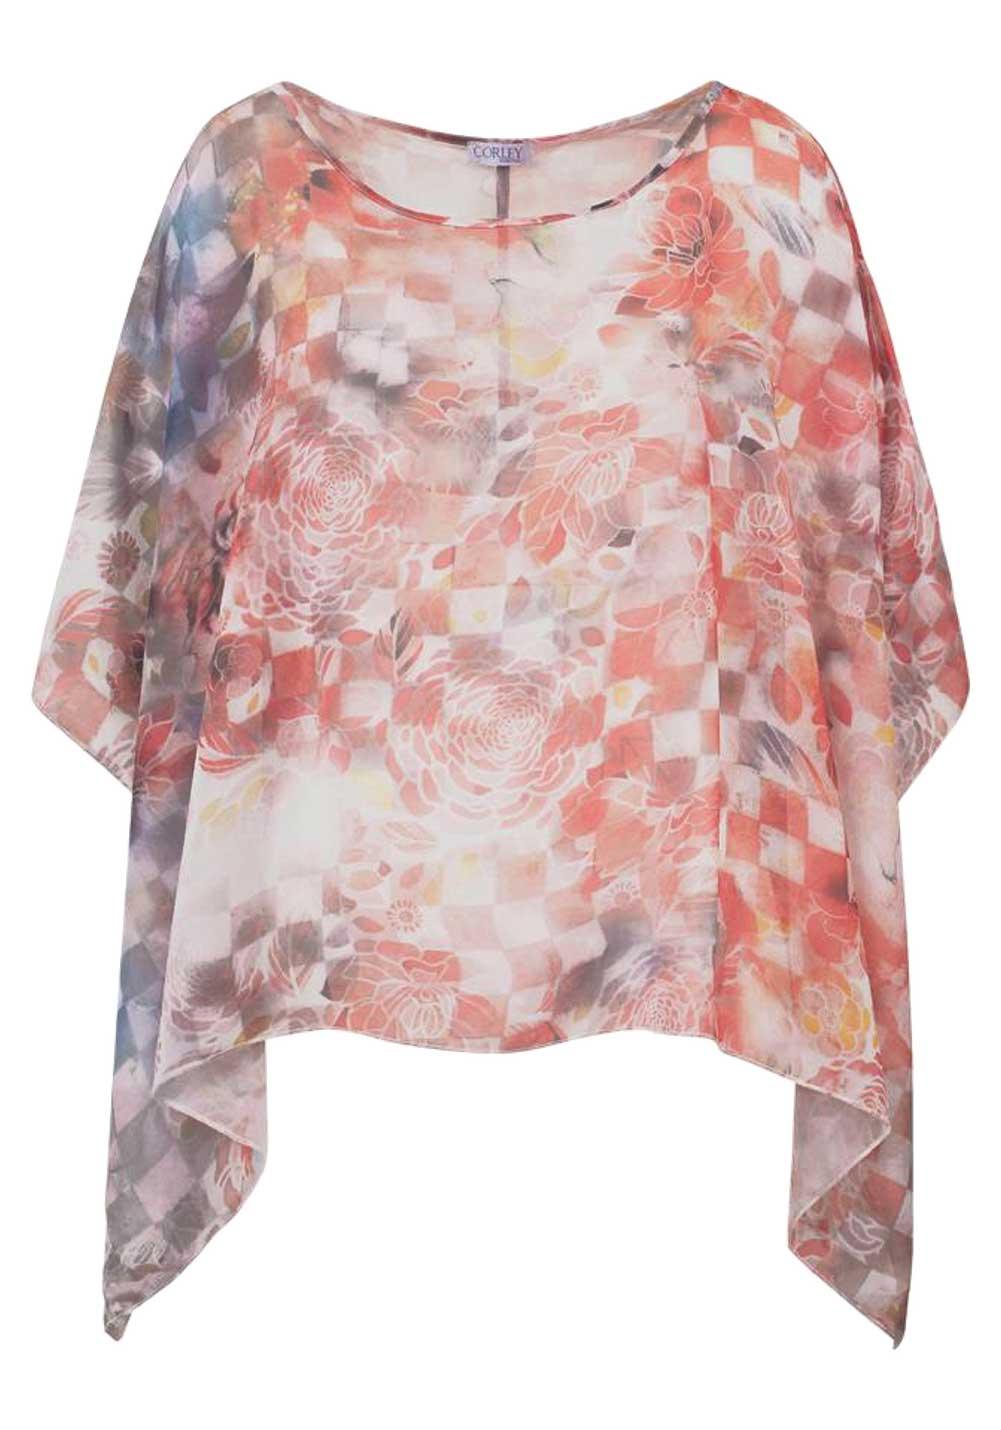 CORLEY Poncho Bluse bunt 723.003 Missforty